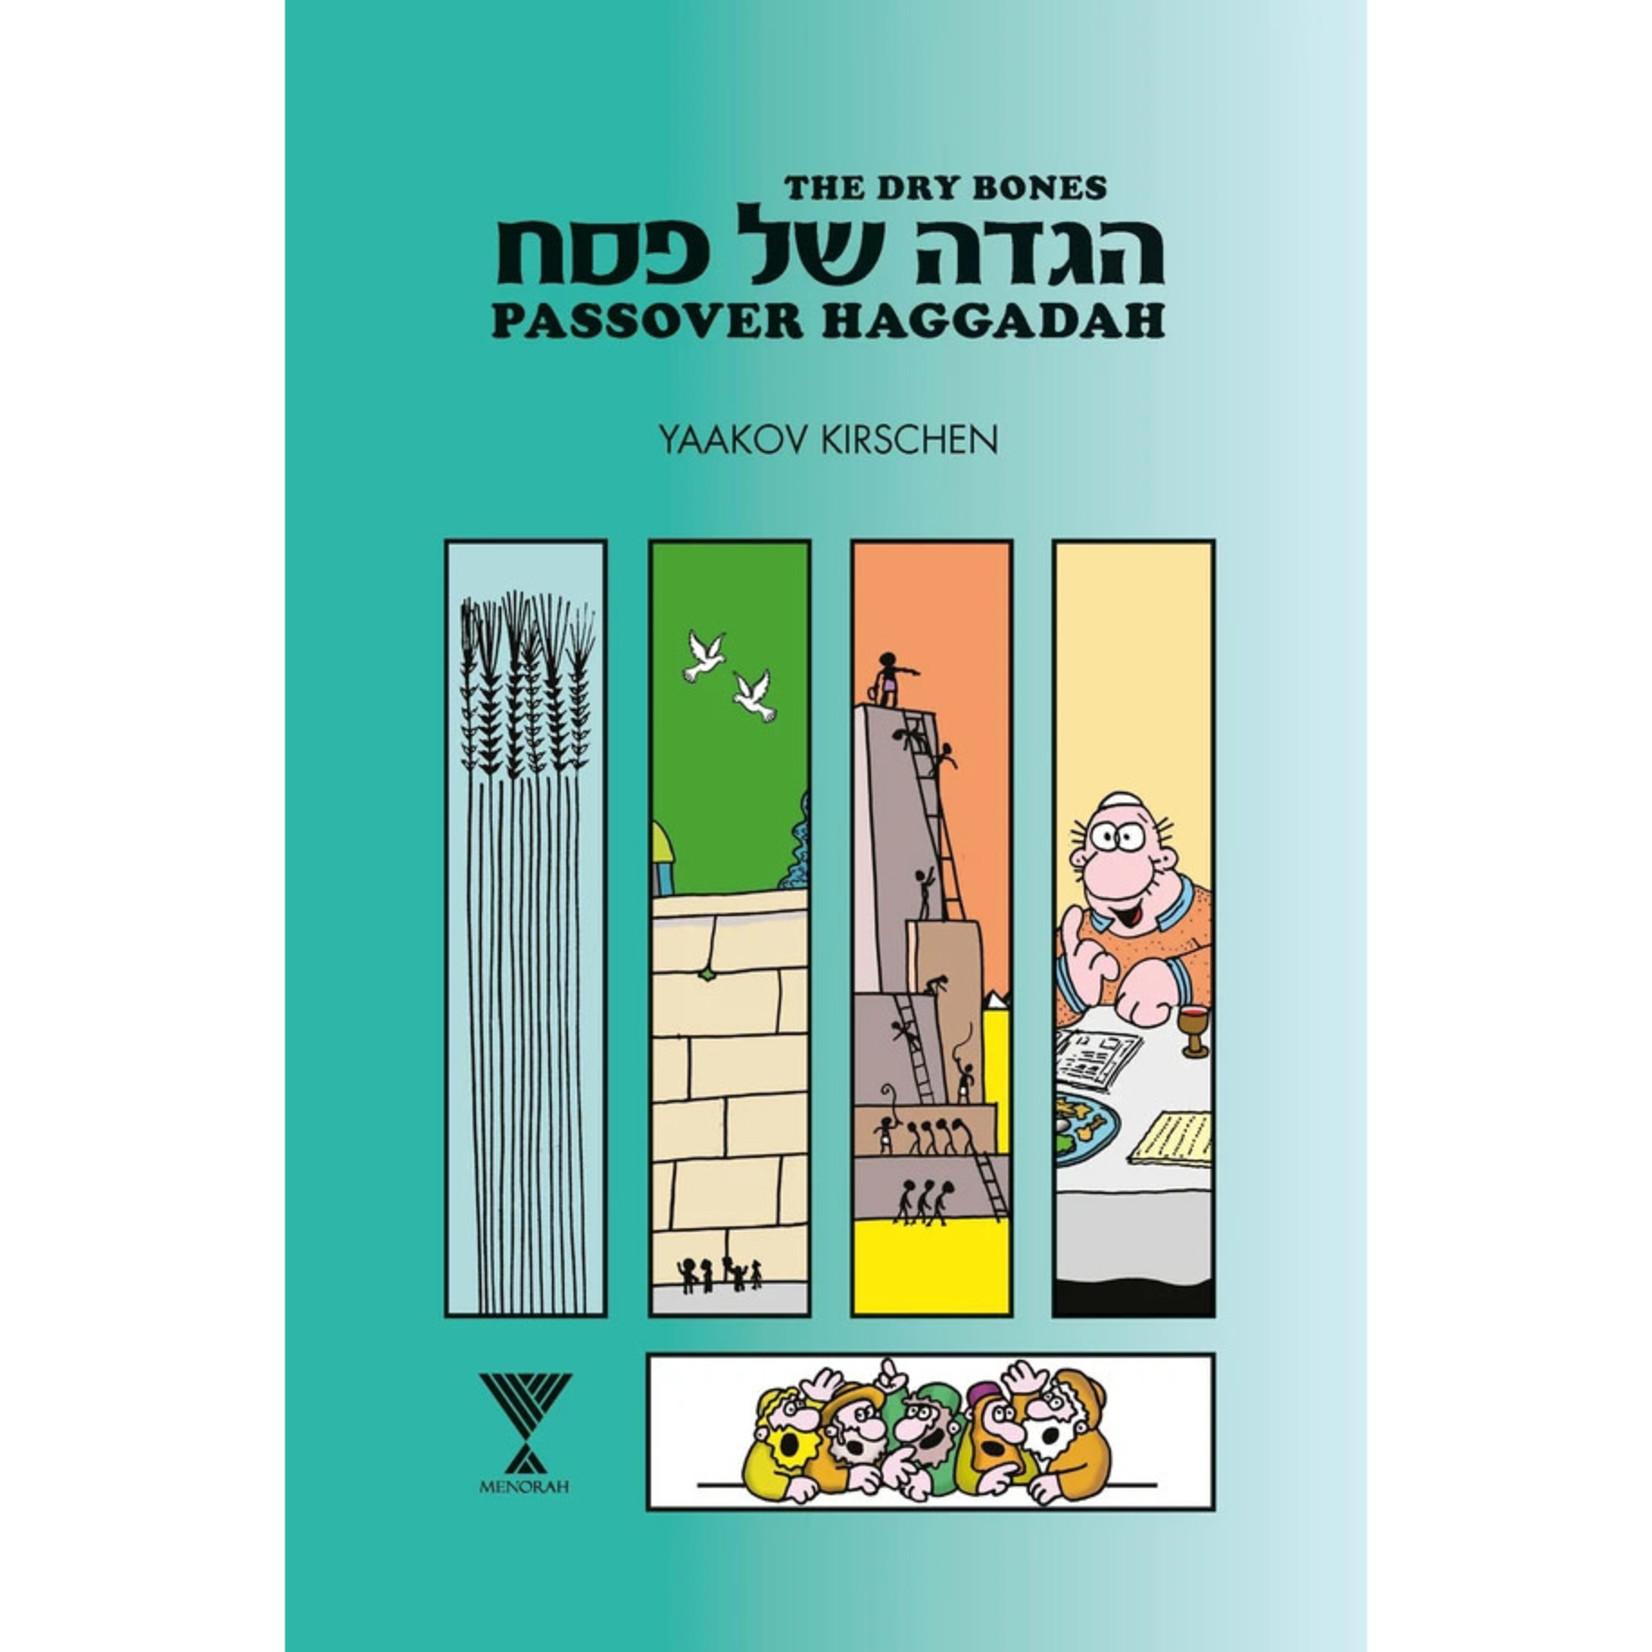 Yaakov Kirschen Dry Bones Passover Haggadah